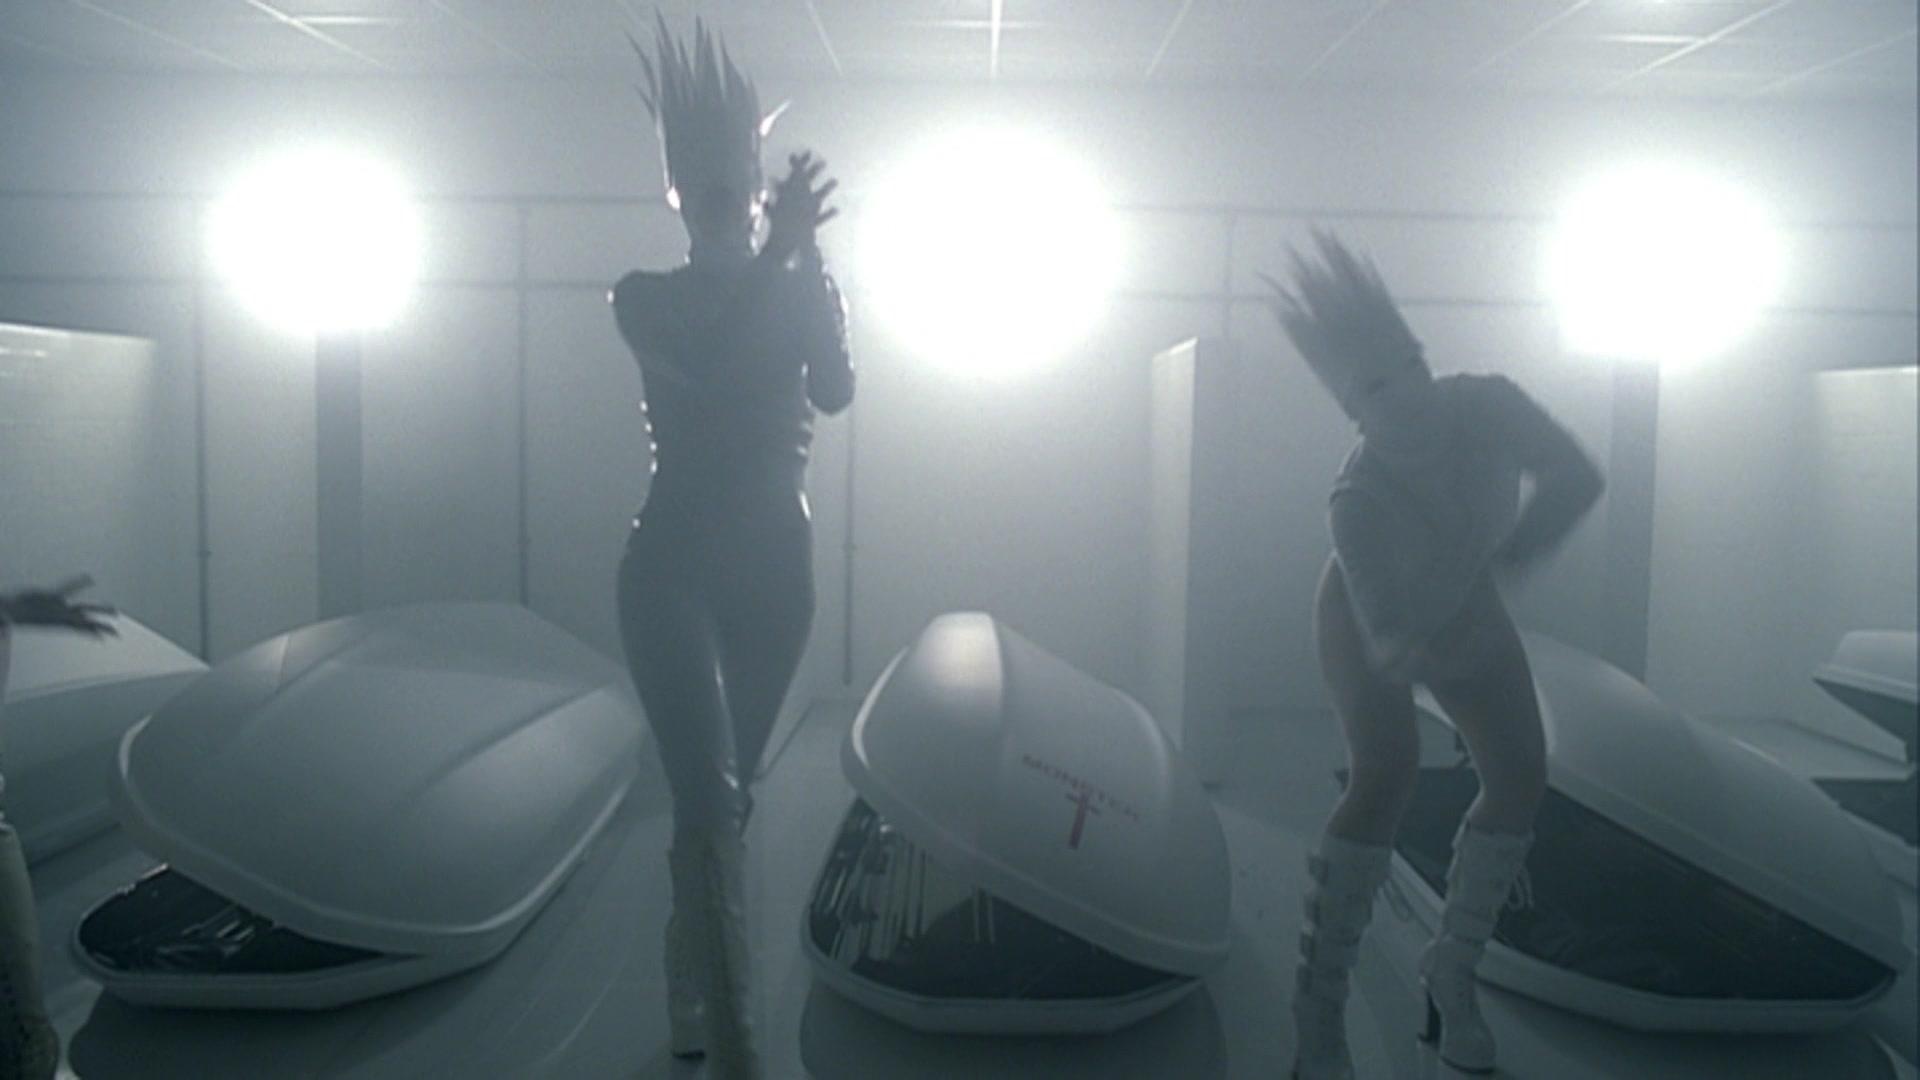 File:Lady Gaga - Bad Romance 007.jpg